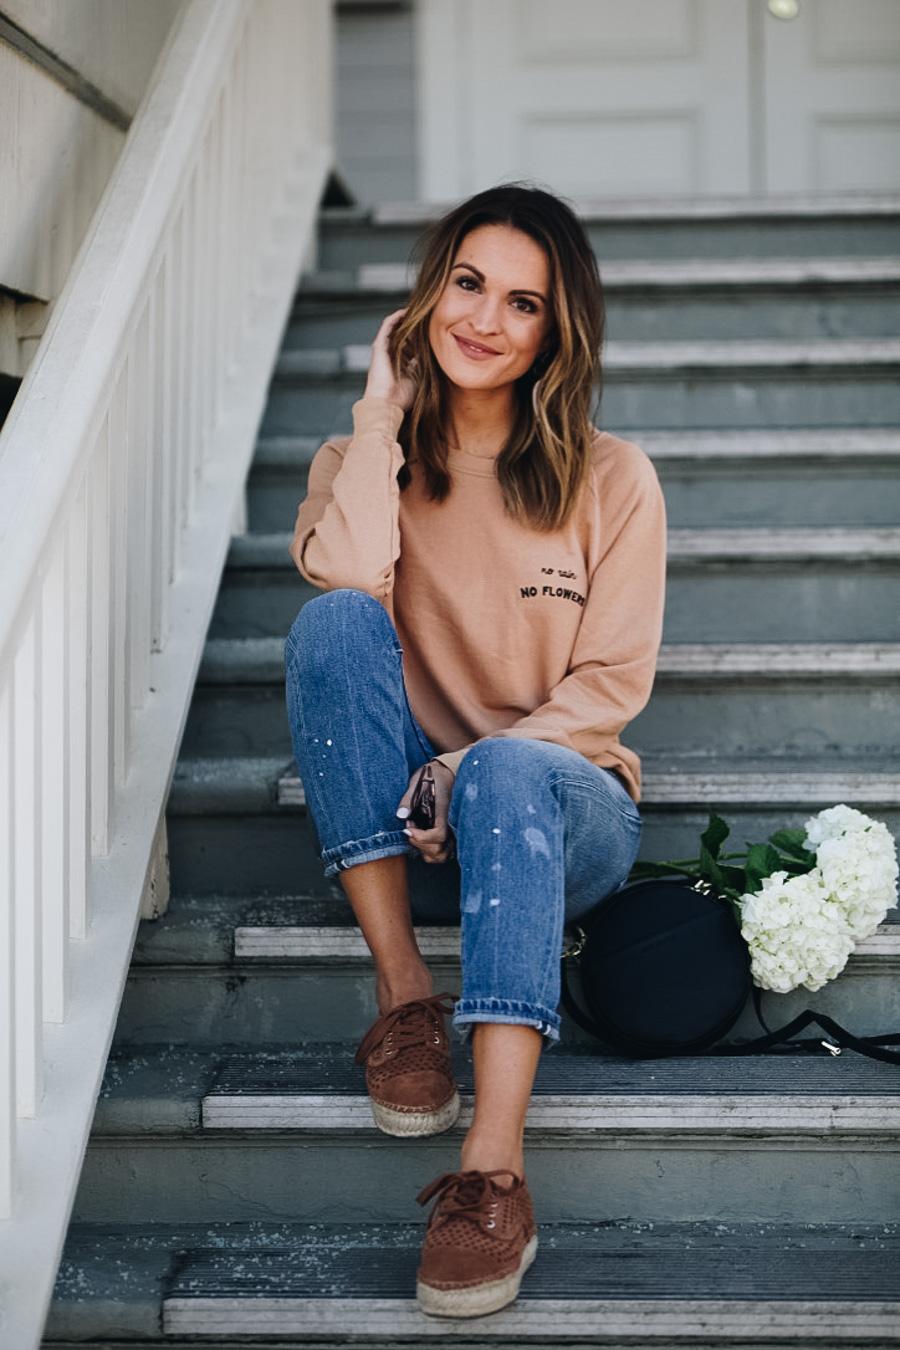 lauren sims free people sweatshirt levis jeans